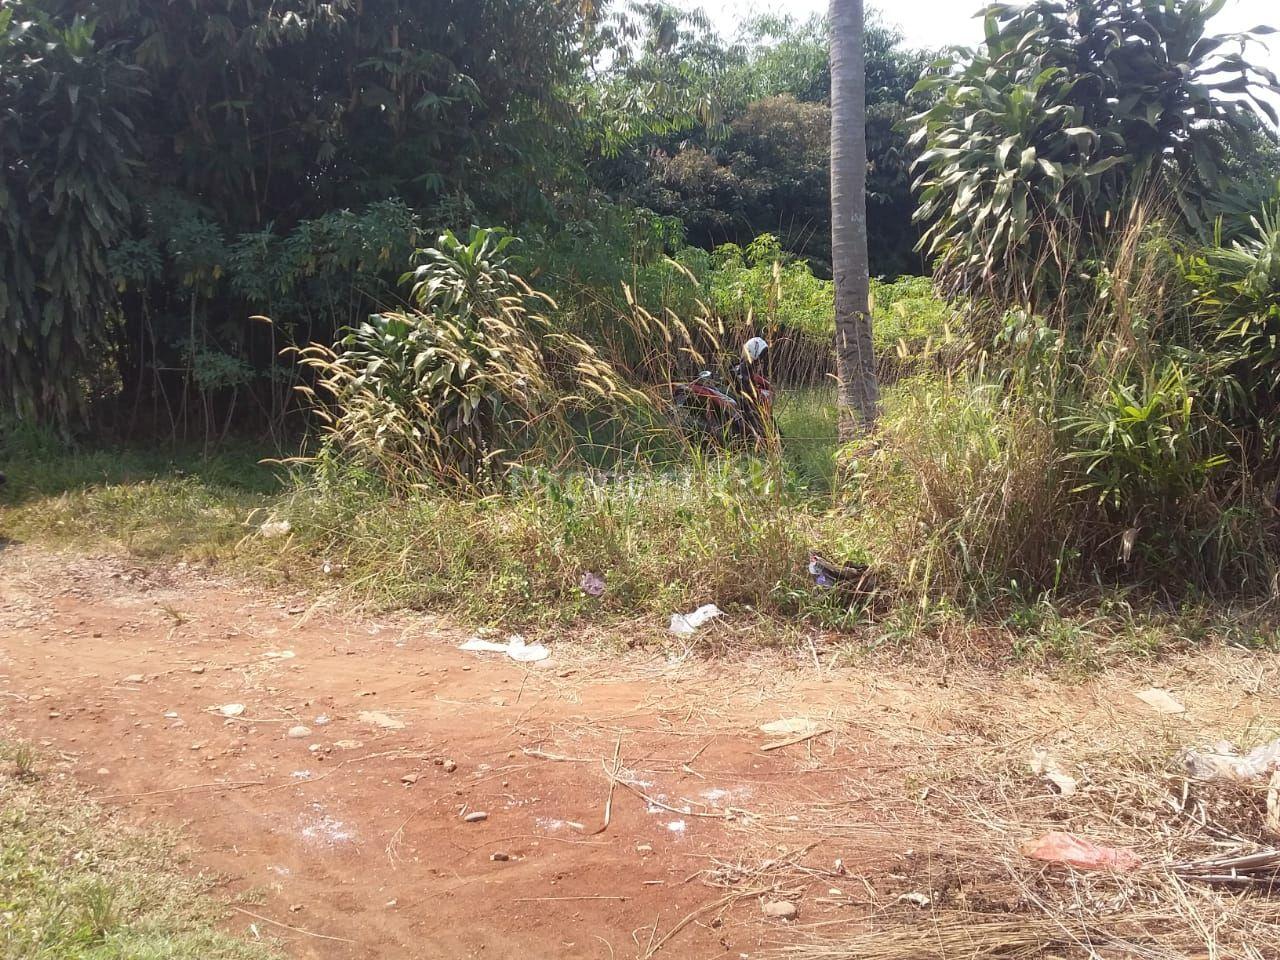 Land for Housing Allocation in Citayam, Tajurhalang